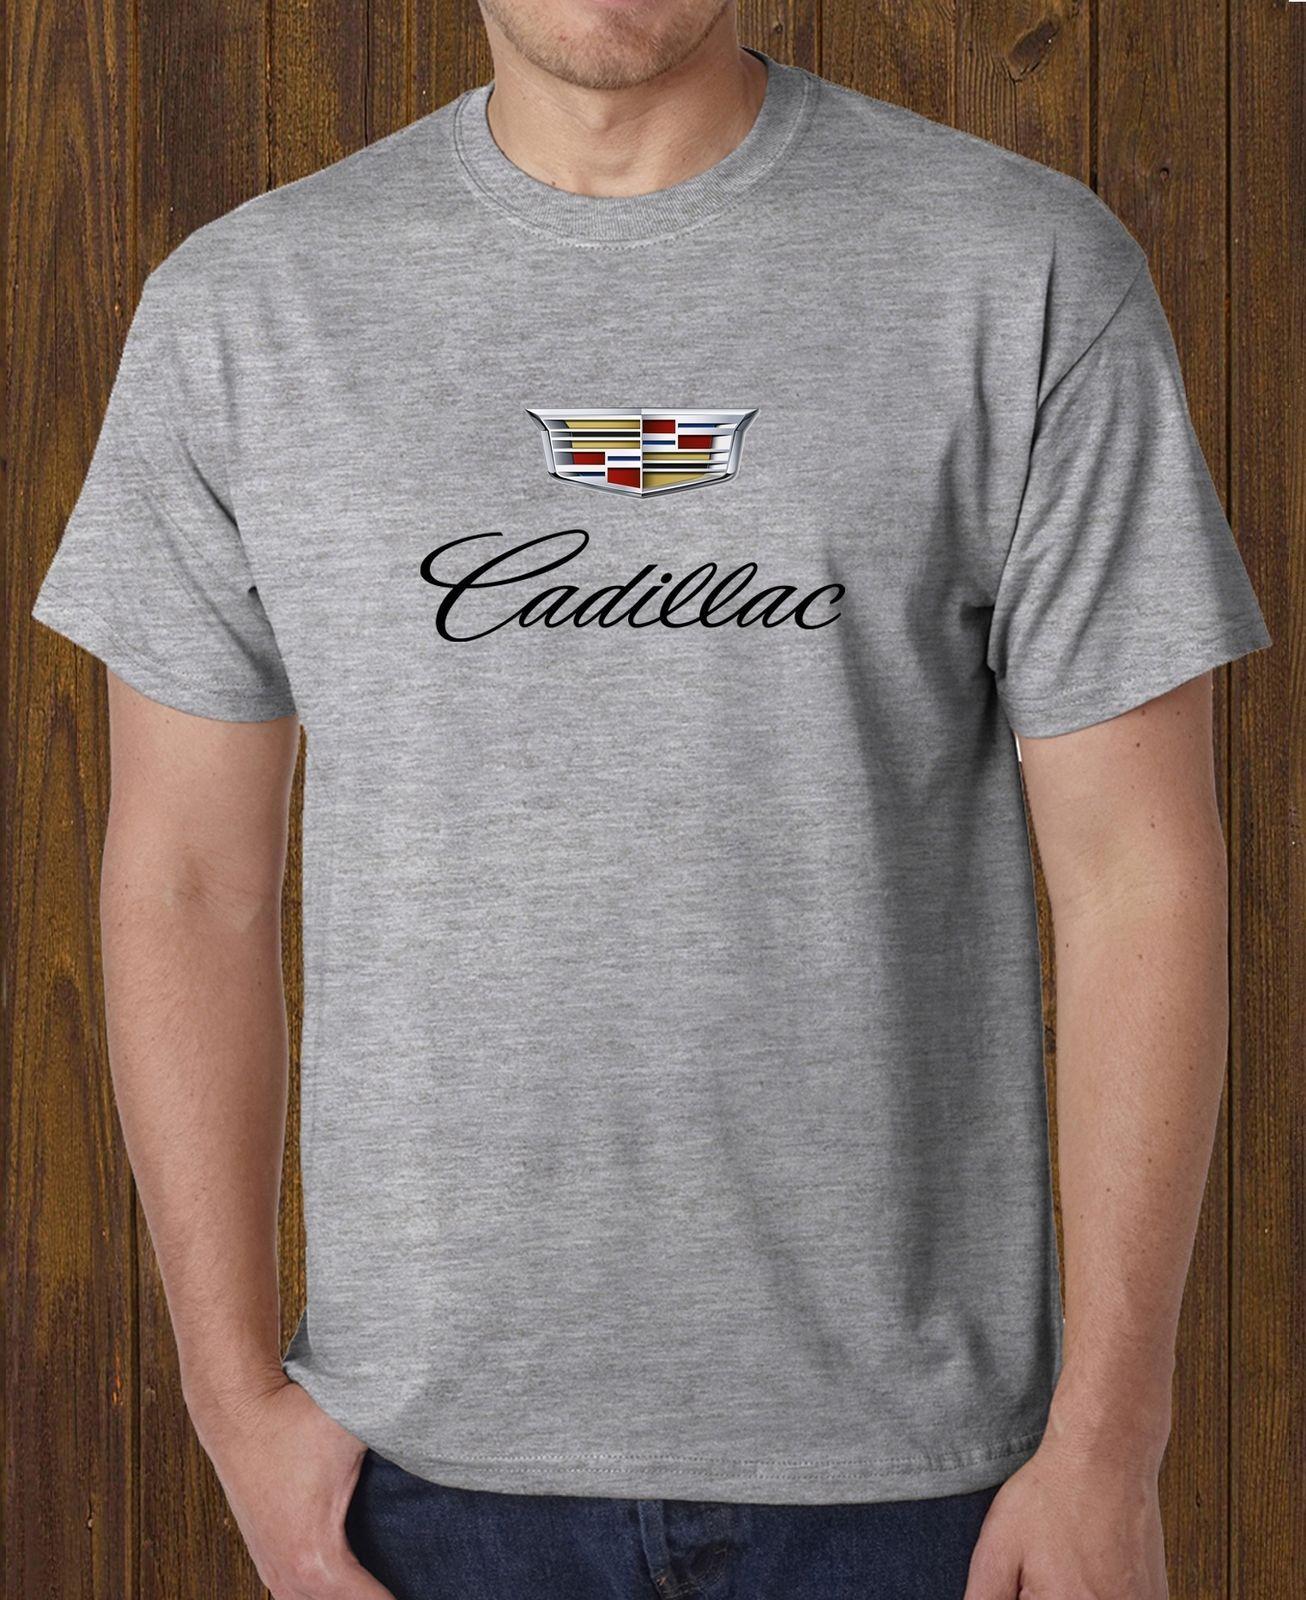 Cadillac Cars Logo Black T Shirt White Grey Men S Tee Size S 3xl Buy